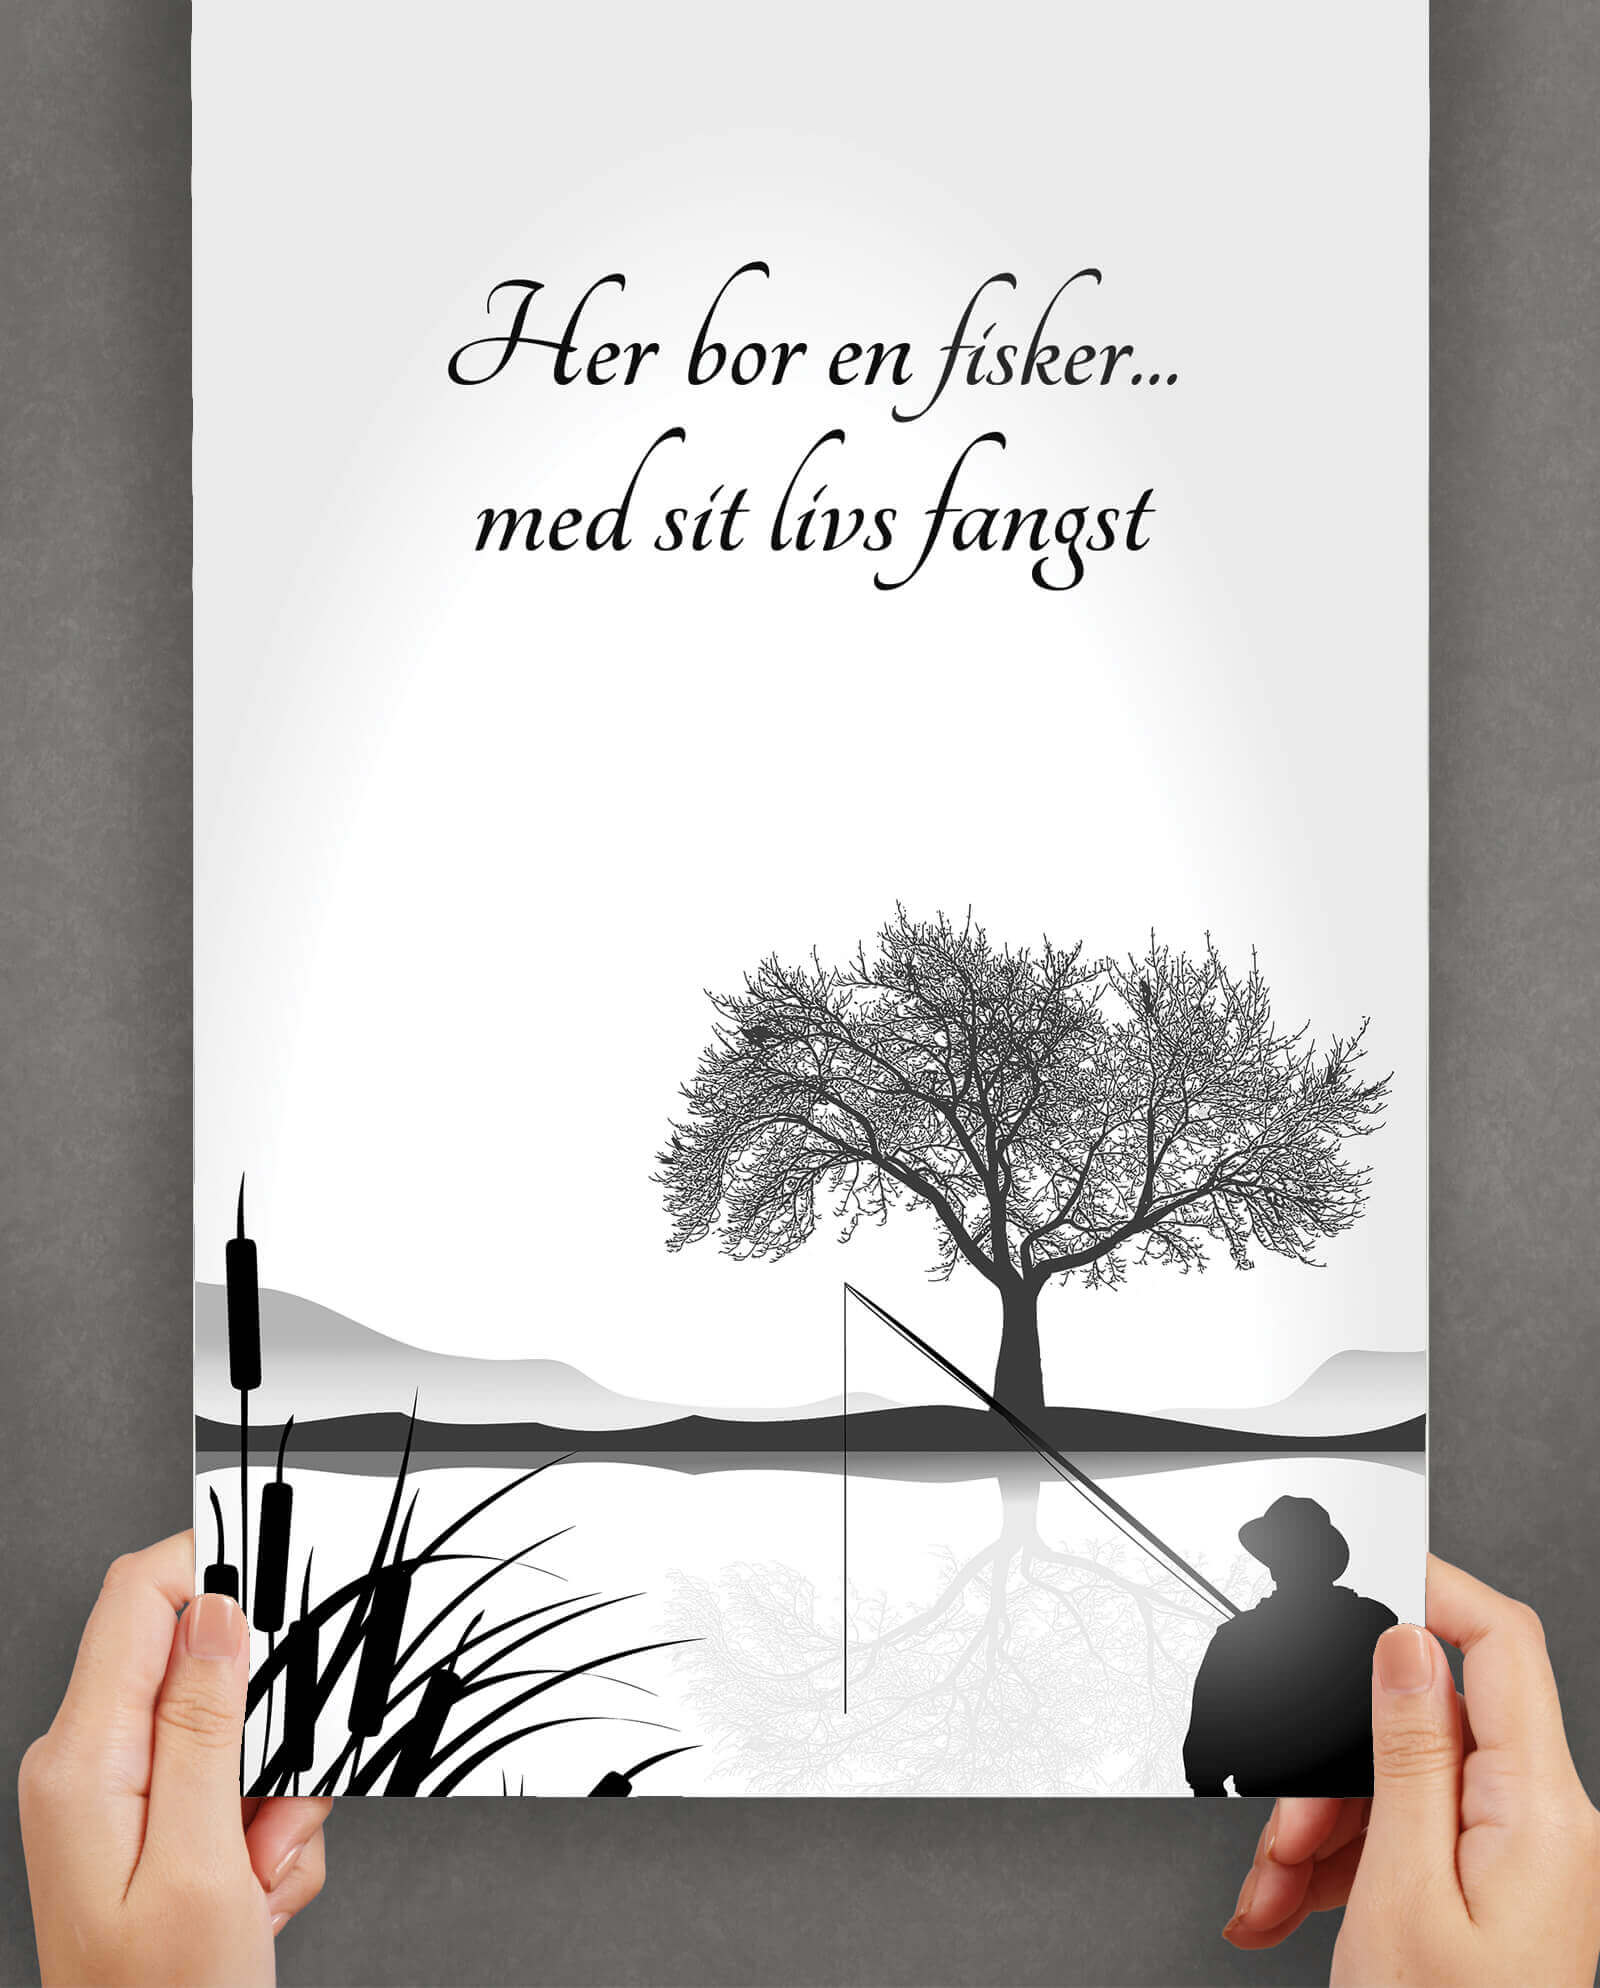 fisker-arbejde-plakat-1